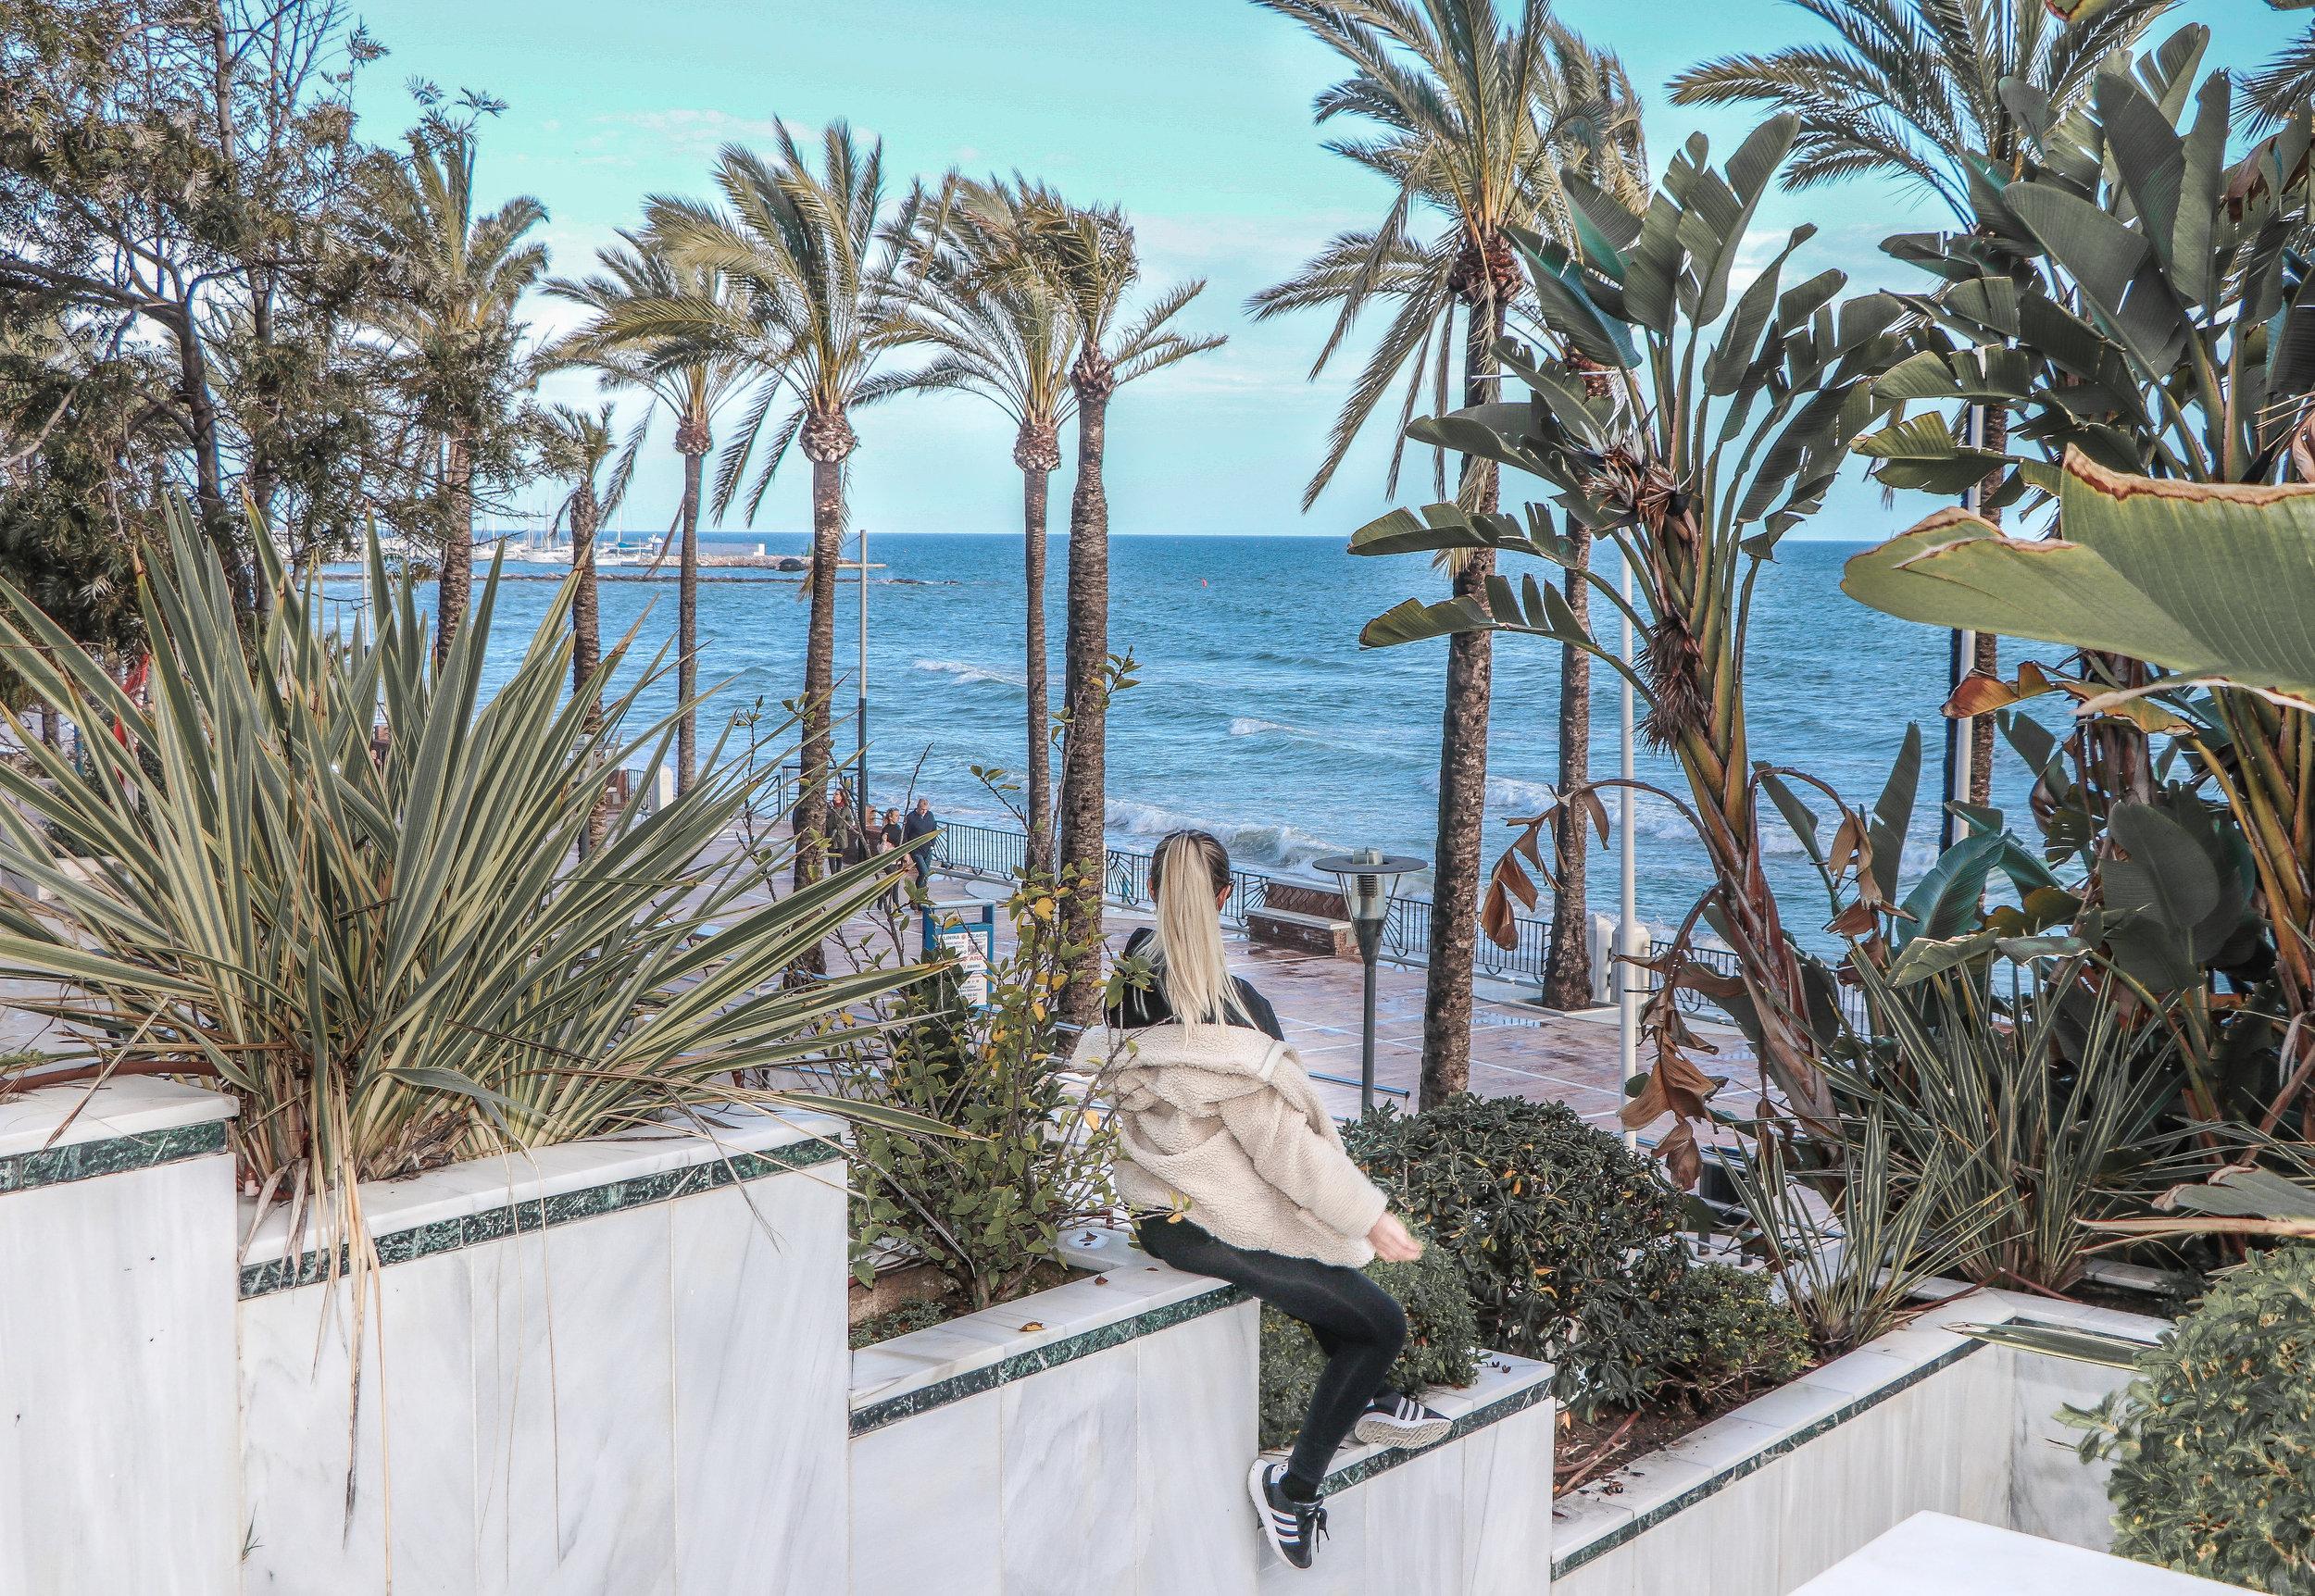 Marbella ocean and beach walk Spain photo by Linda Haggh.jpg